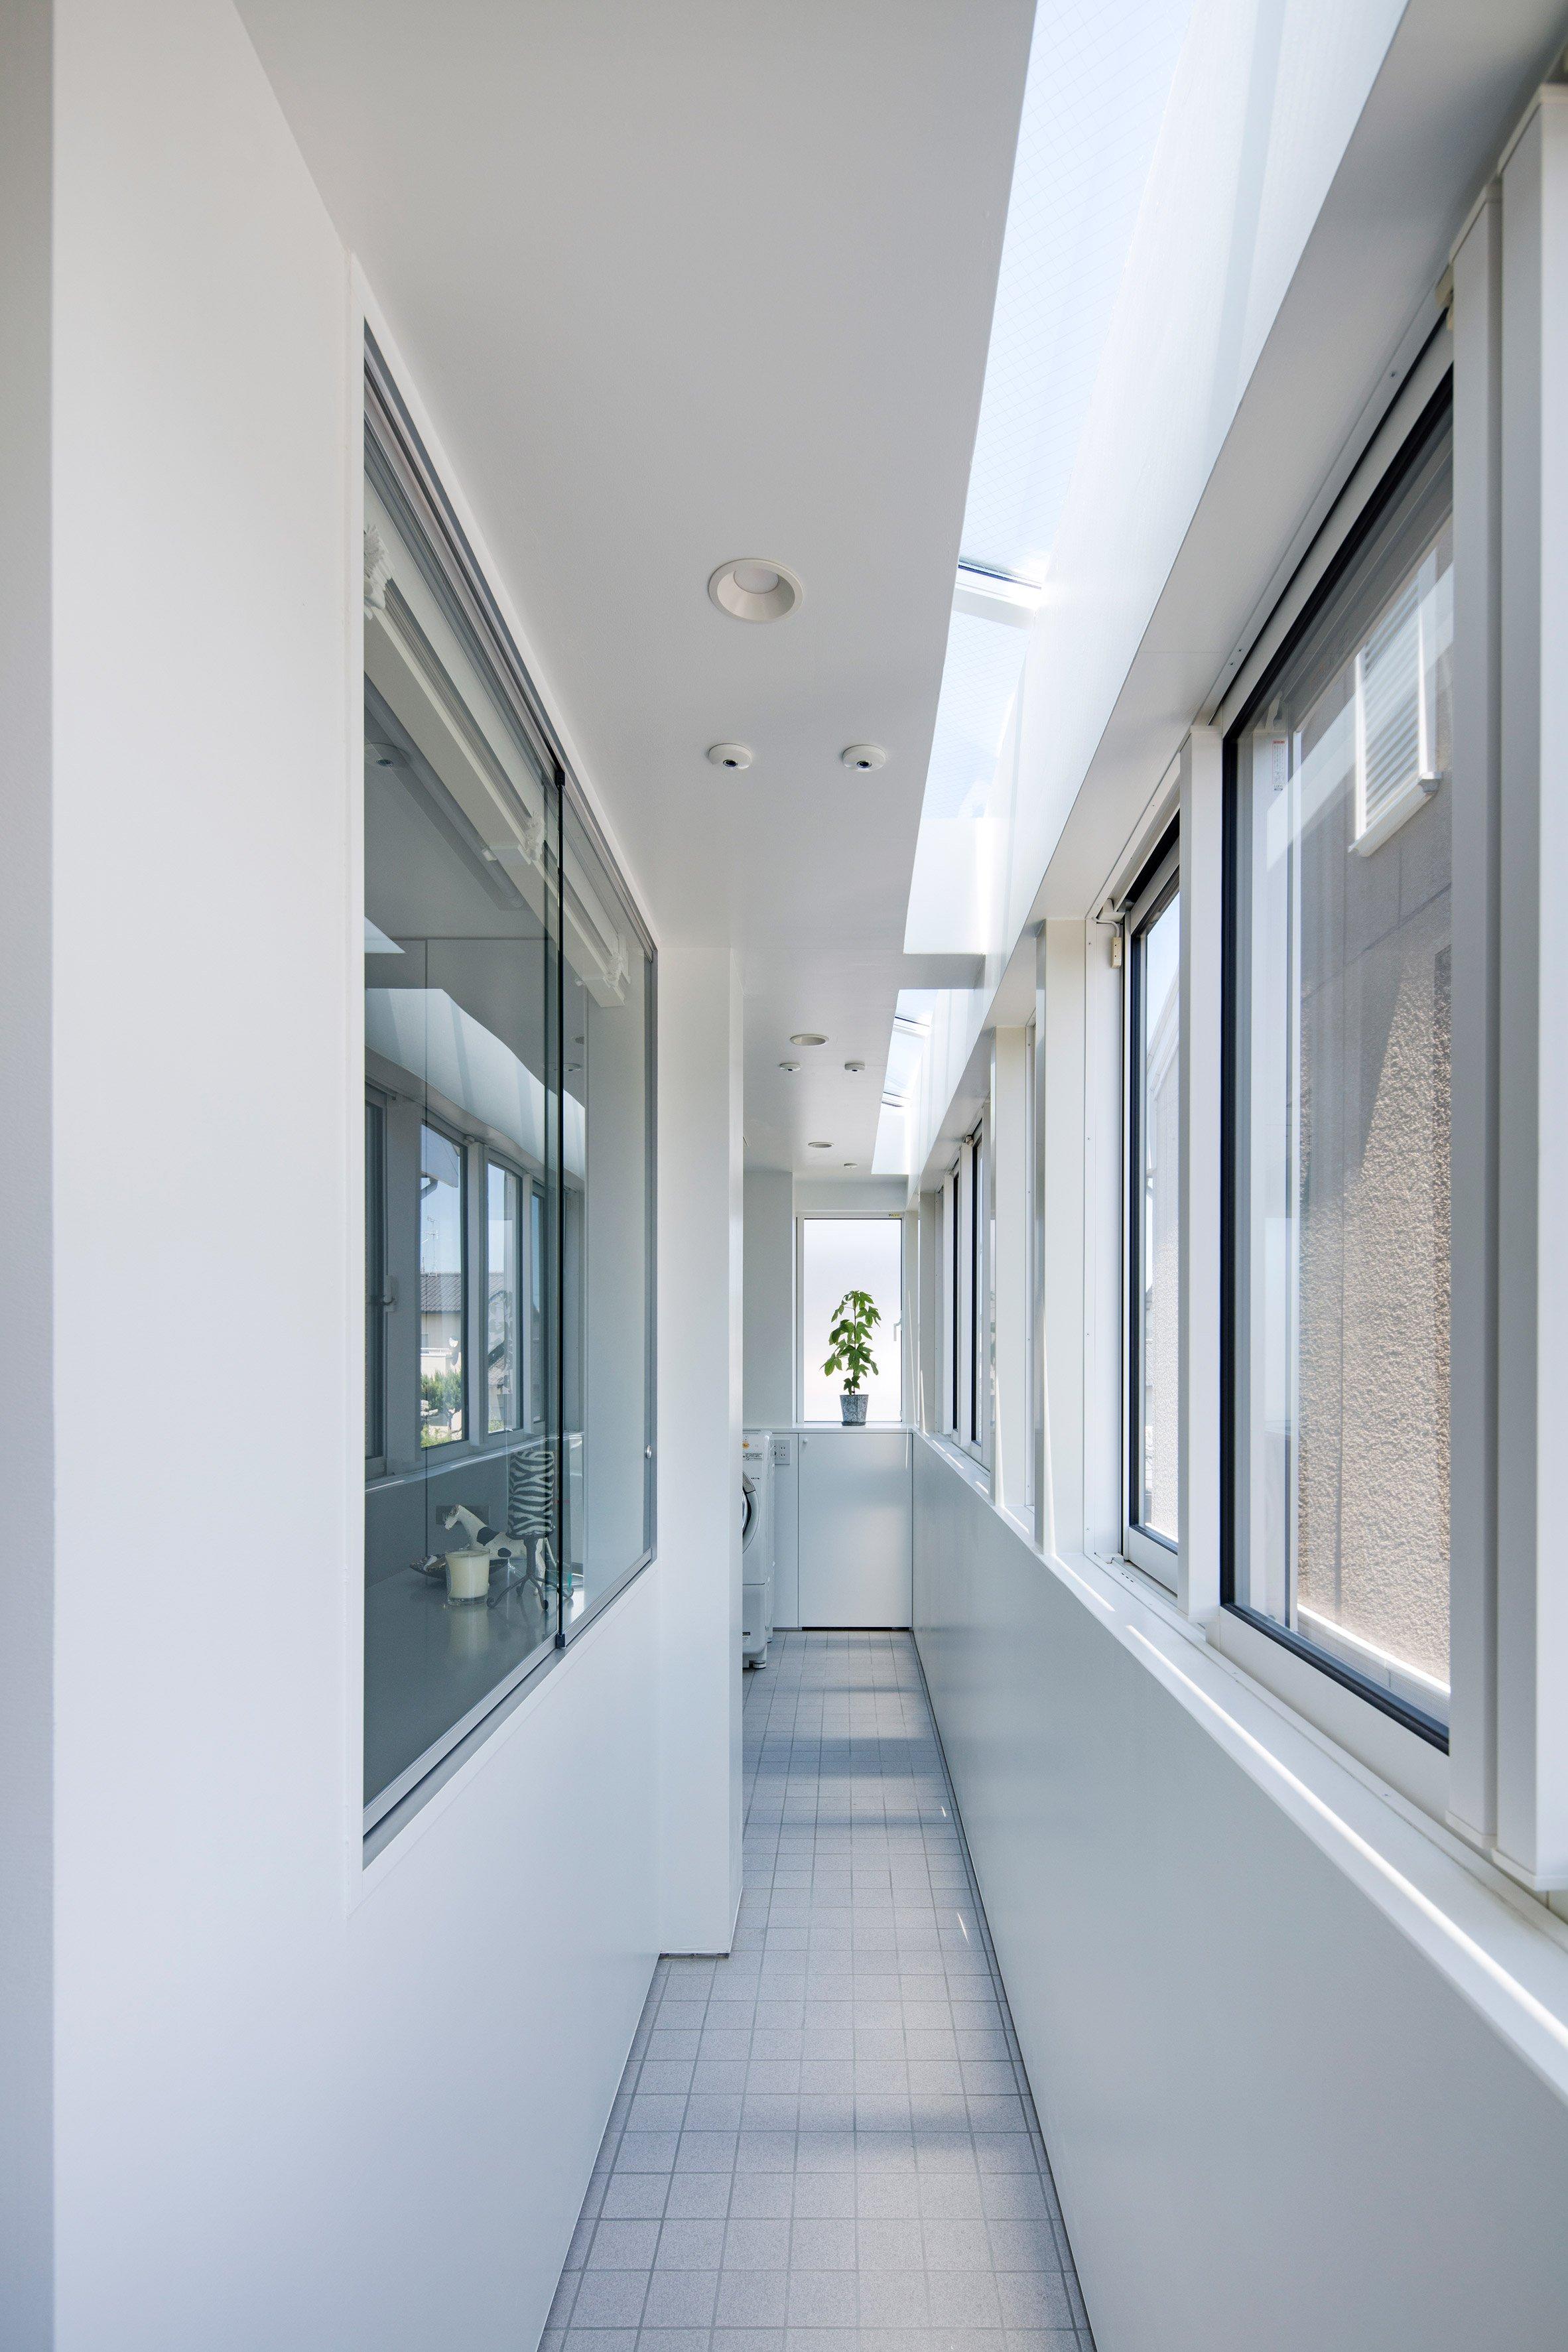 shinbohon-house-k-yuichi-yoshida-associates-architecture-residential-japan-_dezeen_2364_col_7.jpg